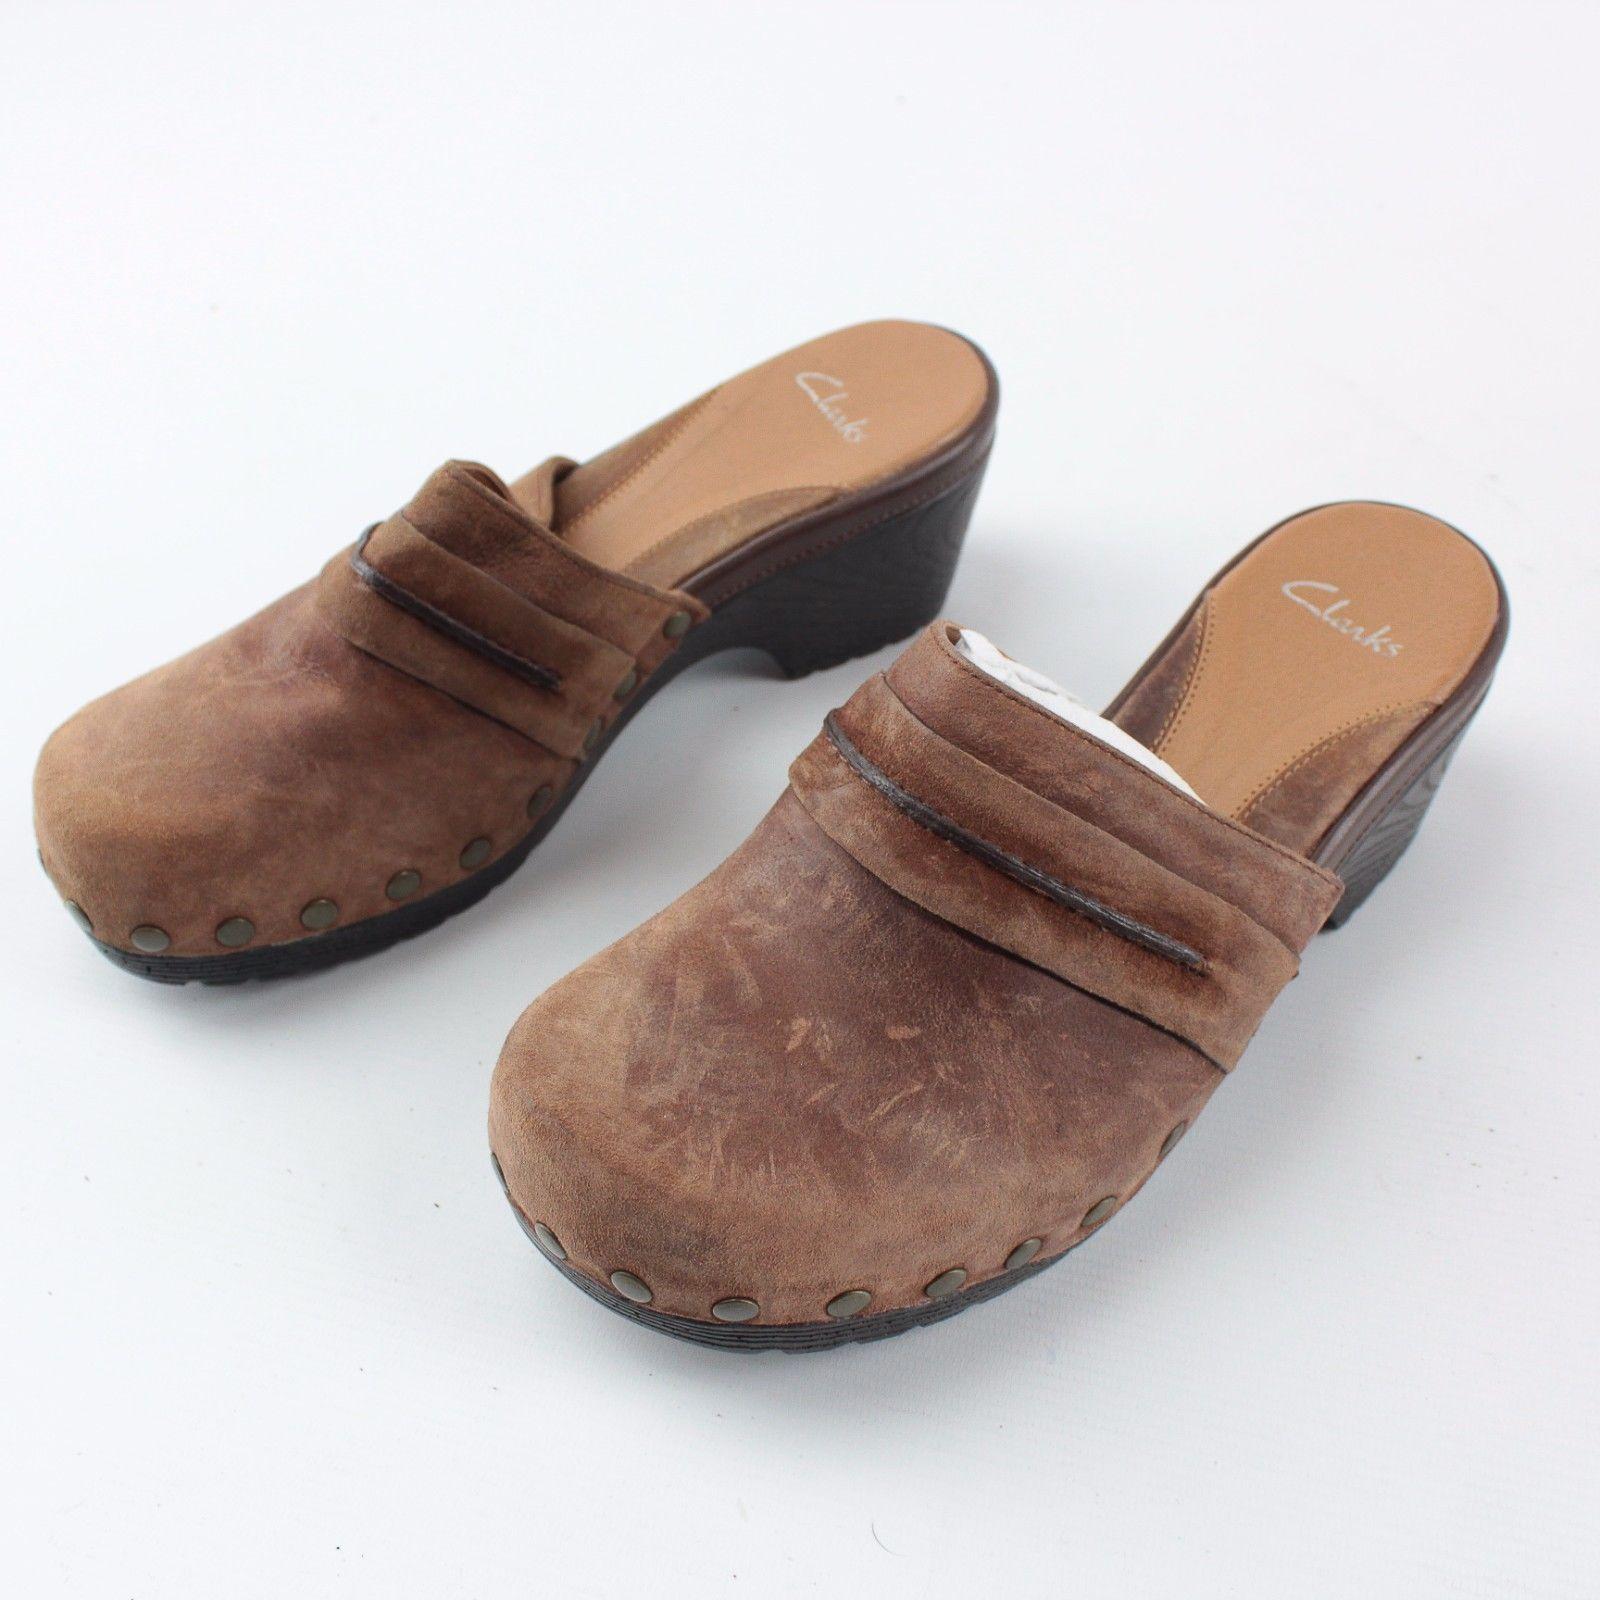 Clarks Ladies Shoes Size 6 1/2  -- Suede